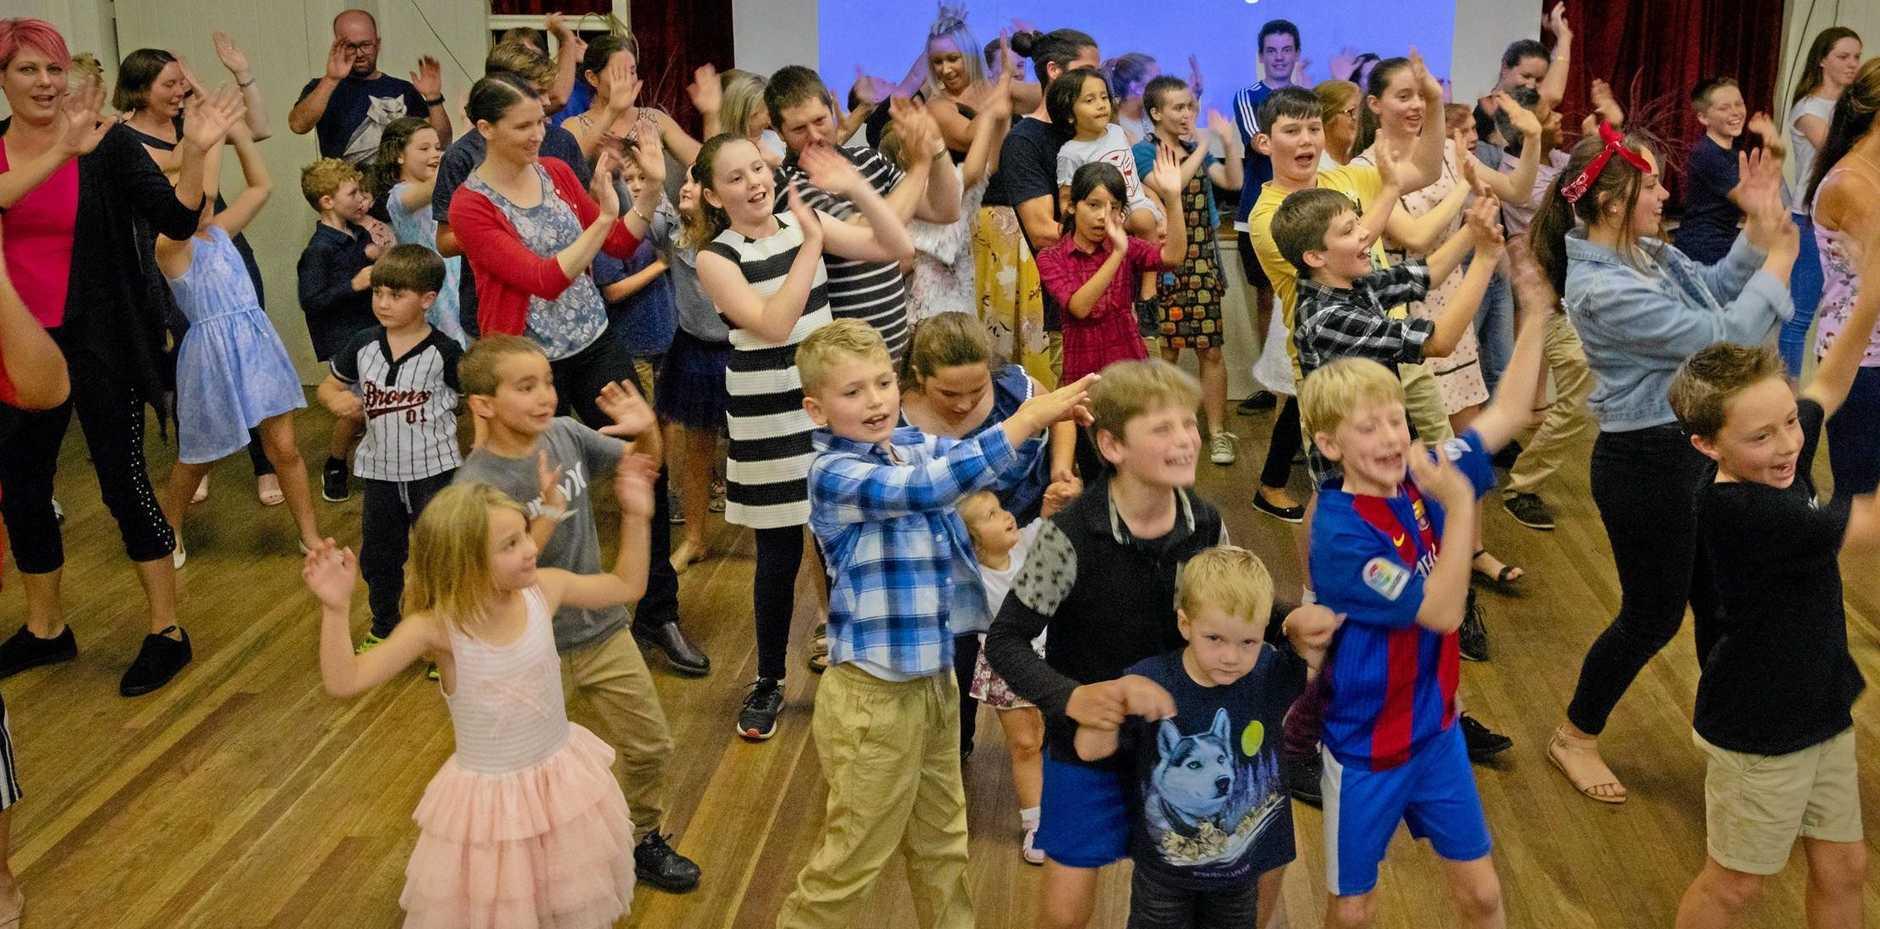 FUN NIGHT: Ballandean students have a dance at awards night.